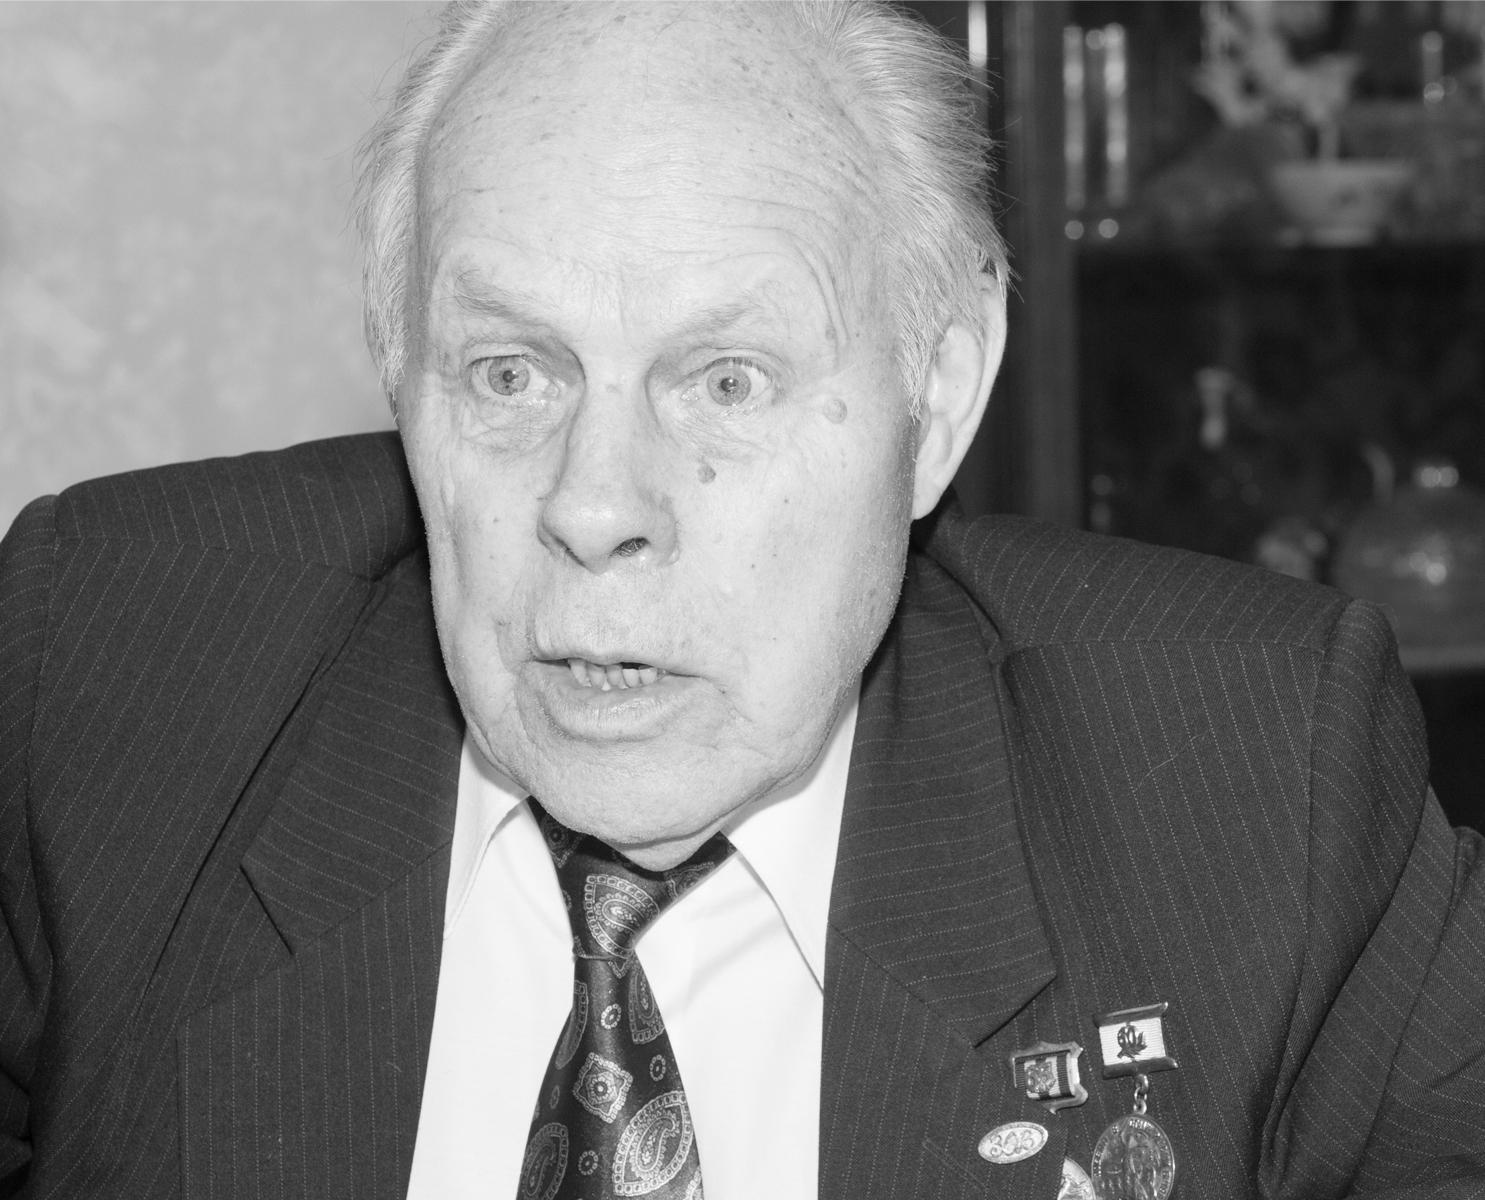 Boris Serafimovich Kryzhanovsky